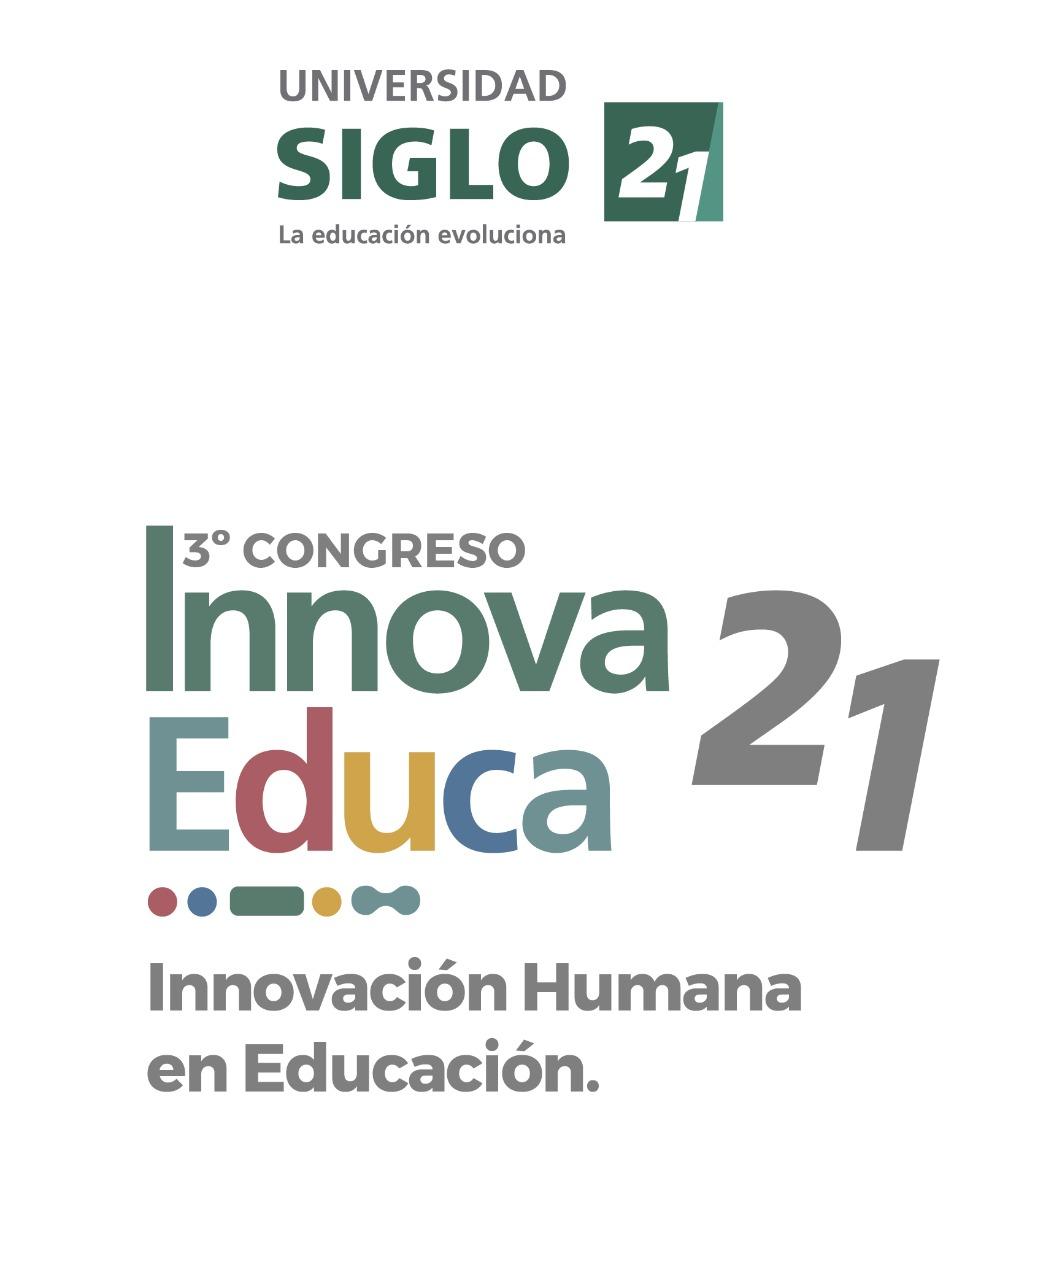 3° Congreso Innova Educa